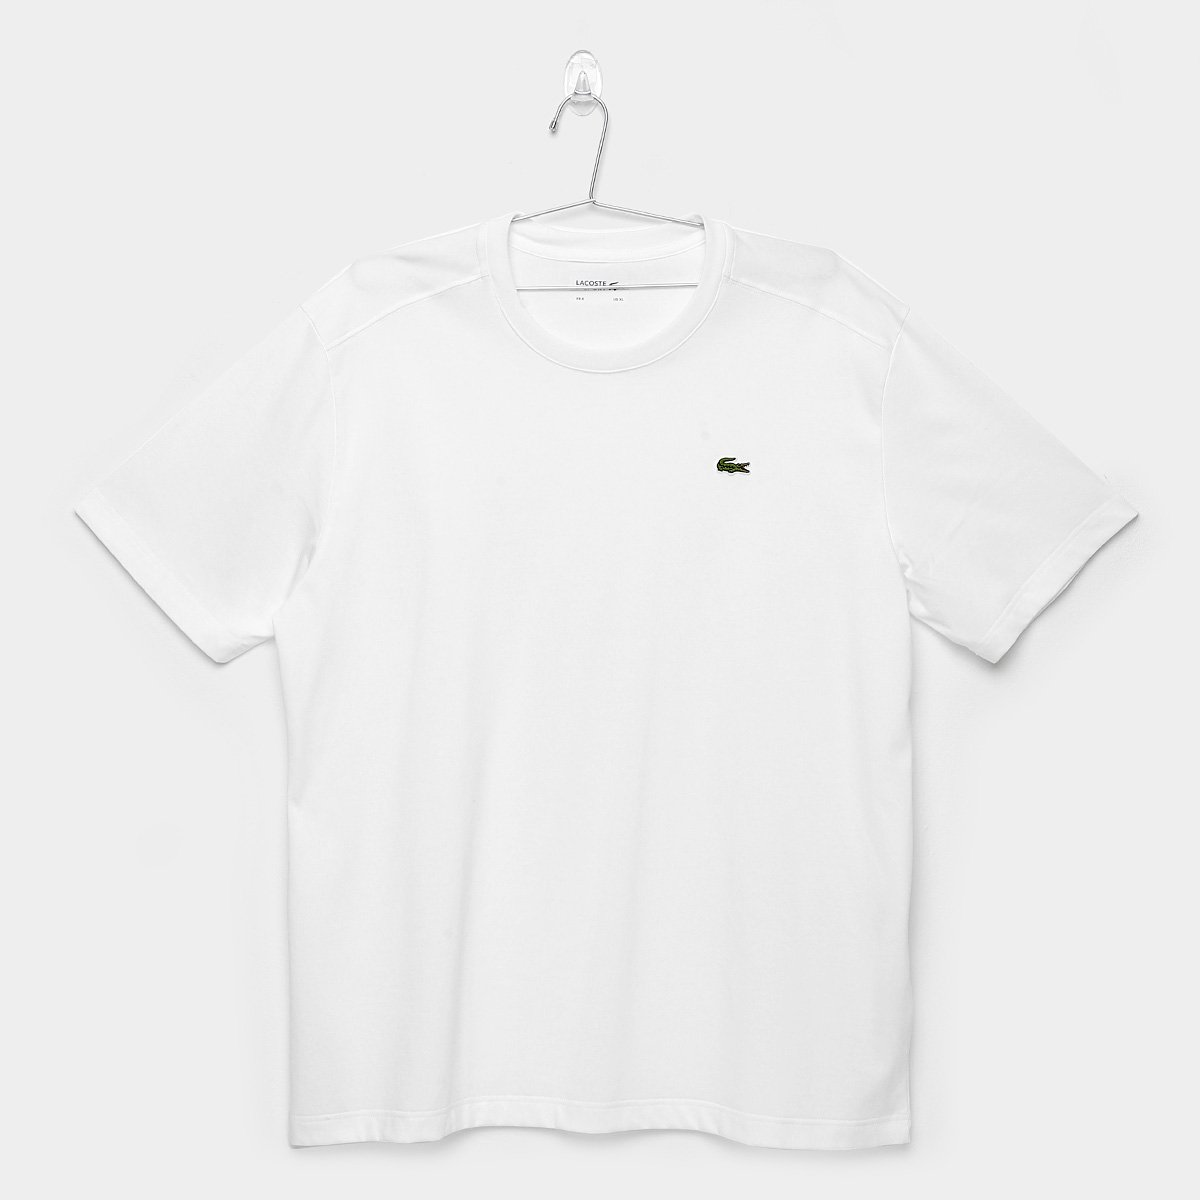 6bdb6c0c36acb Camisetas Lacoste - Ótimos Preços   Zattini